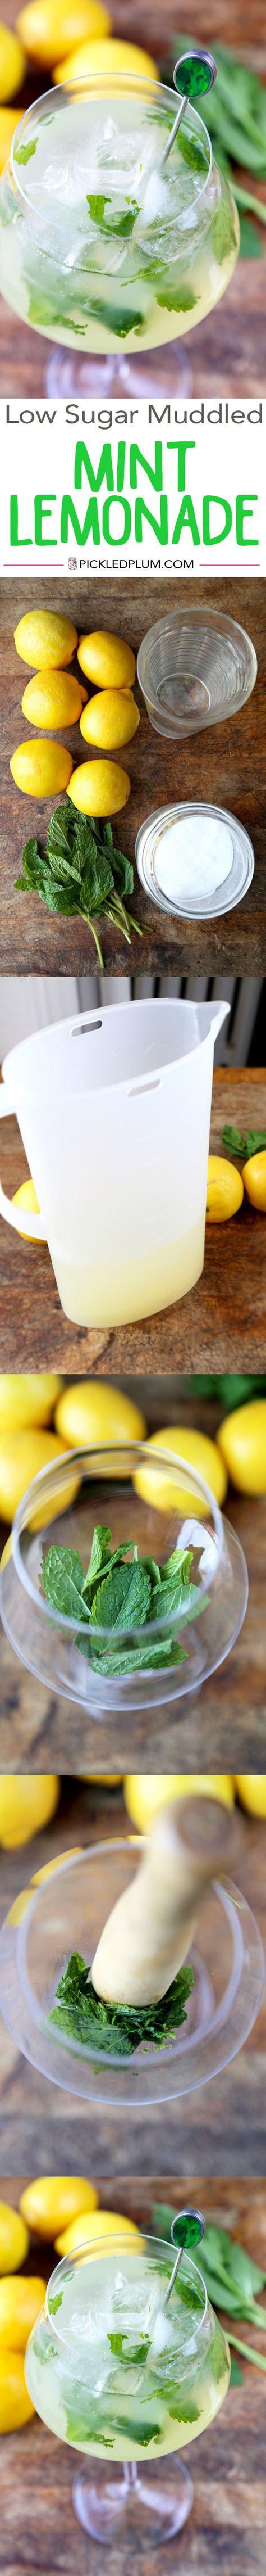 Drinks: Low Sugar Muddled Mint Lemonade Recipe - Easy, Vegan, Gluten-Free and Tart! #healthy